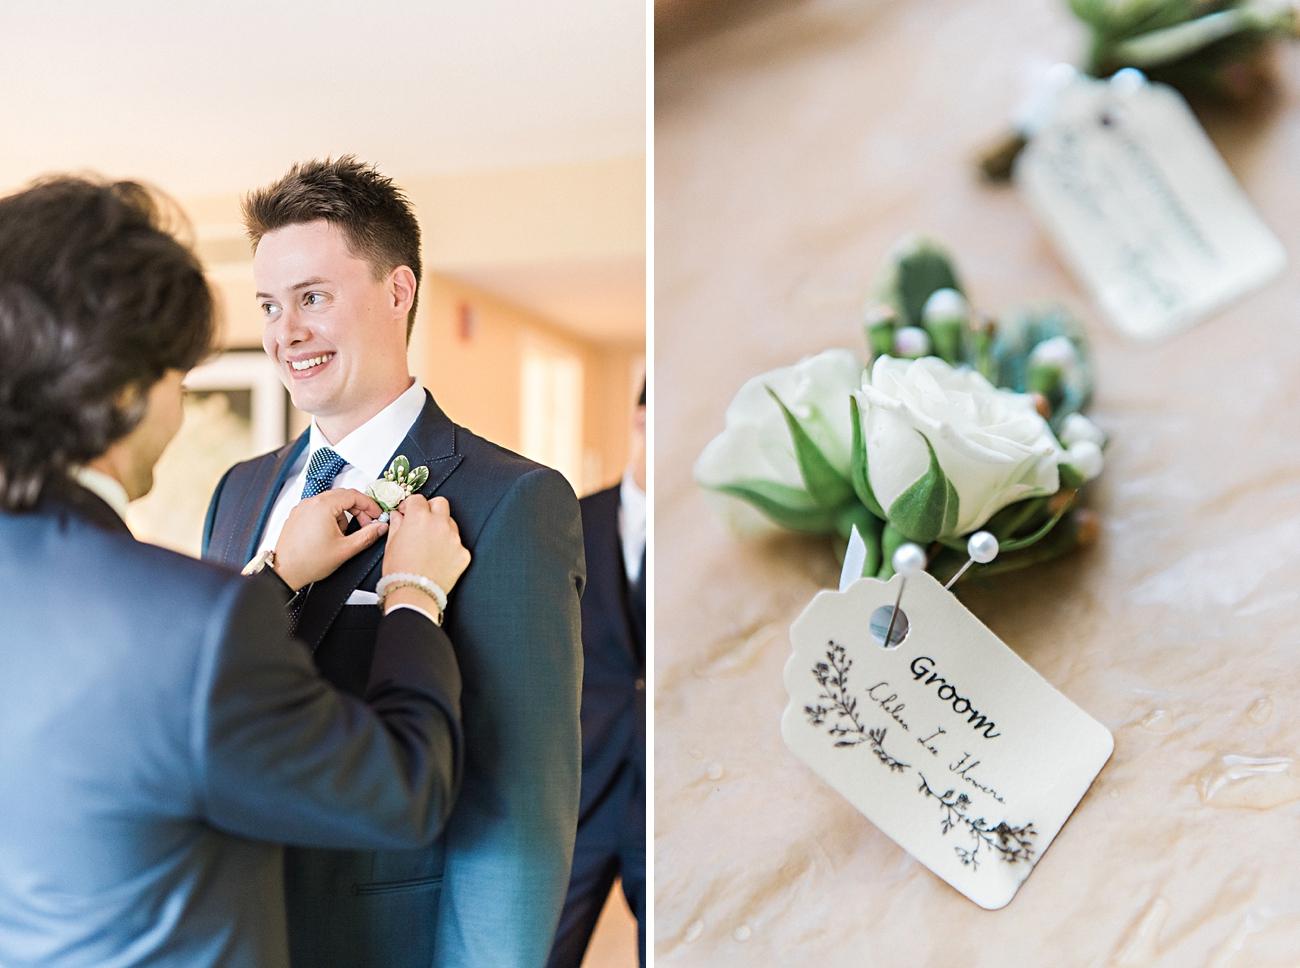 Sara-Seans-Halifax-Prince-George-Hotel-Wedding025.jpg